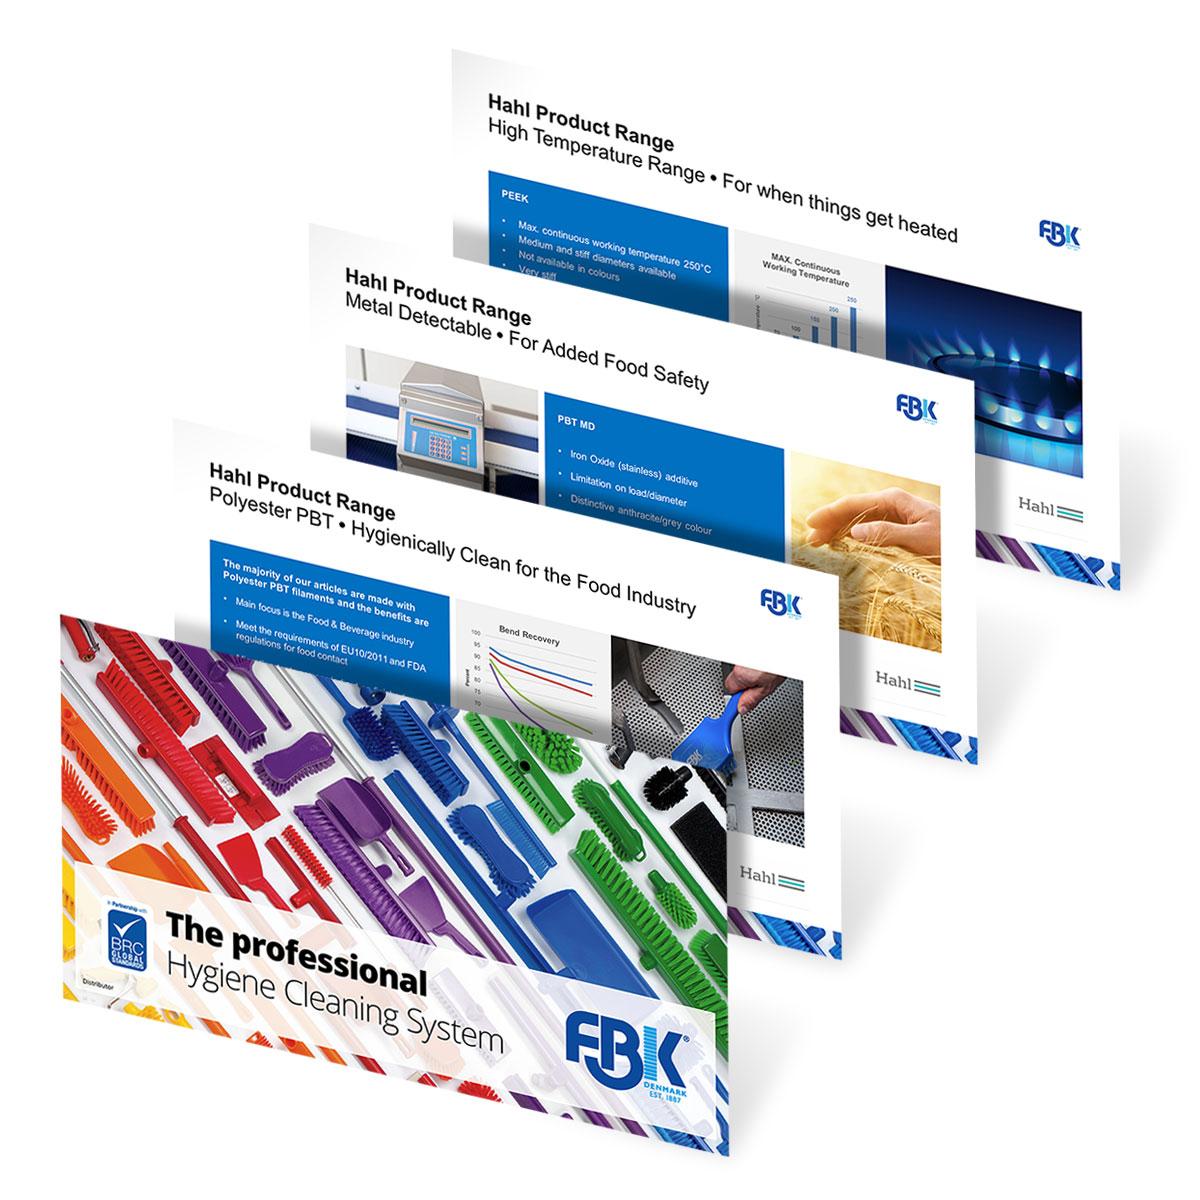 Powerpoint Design Digital Design Slideshow Design FBK